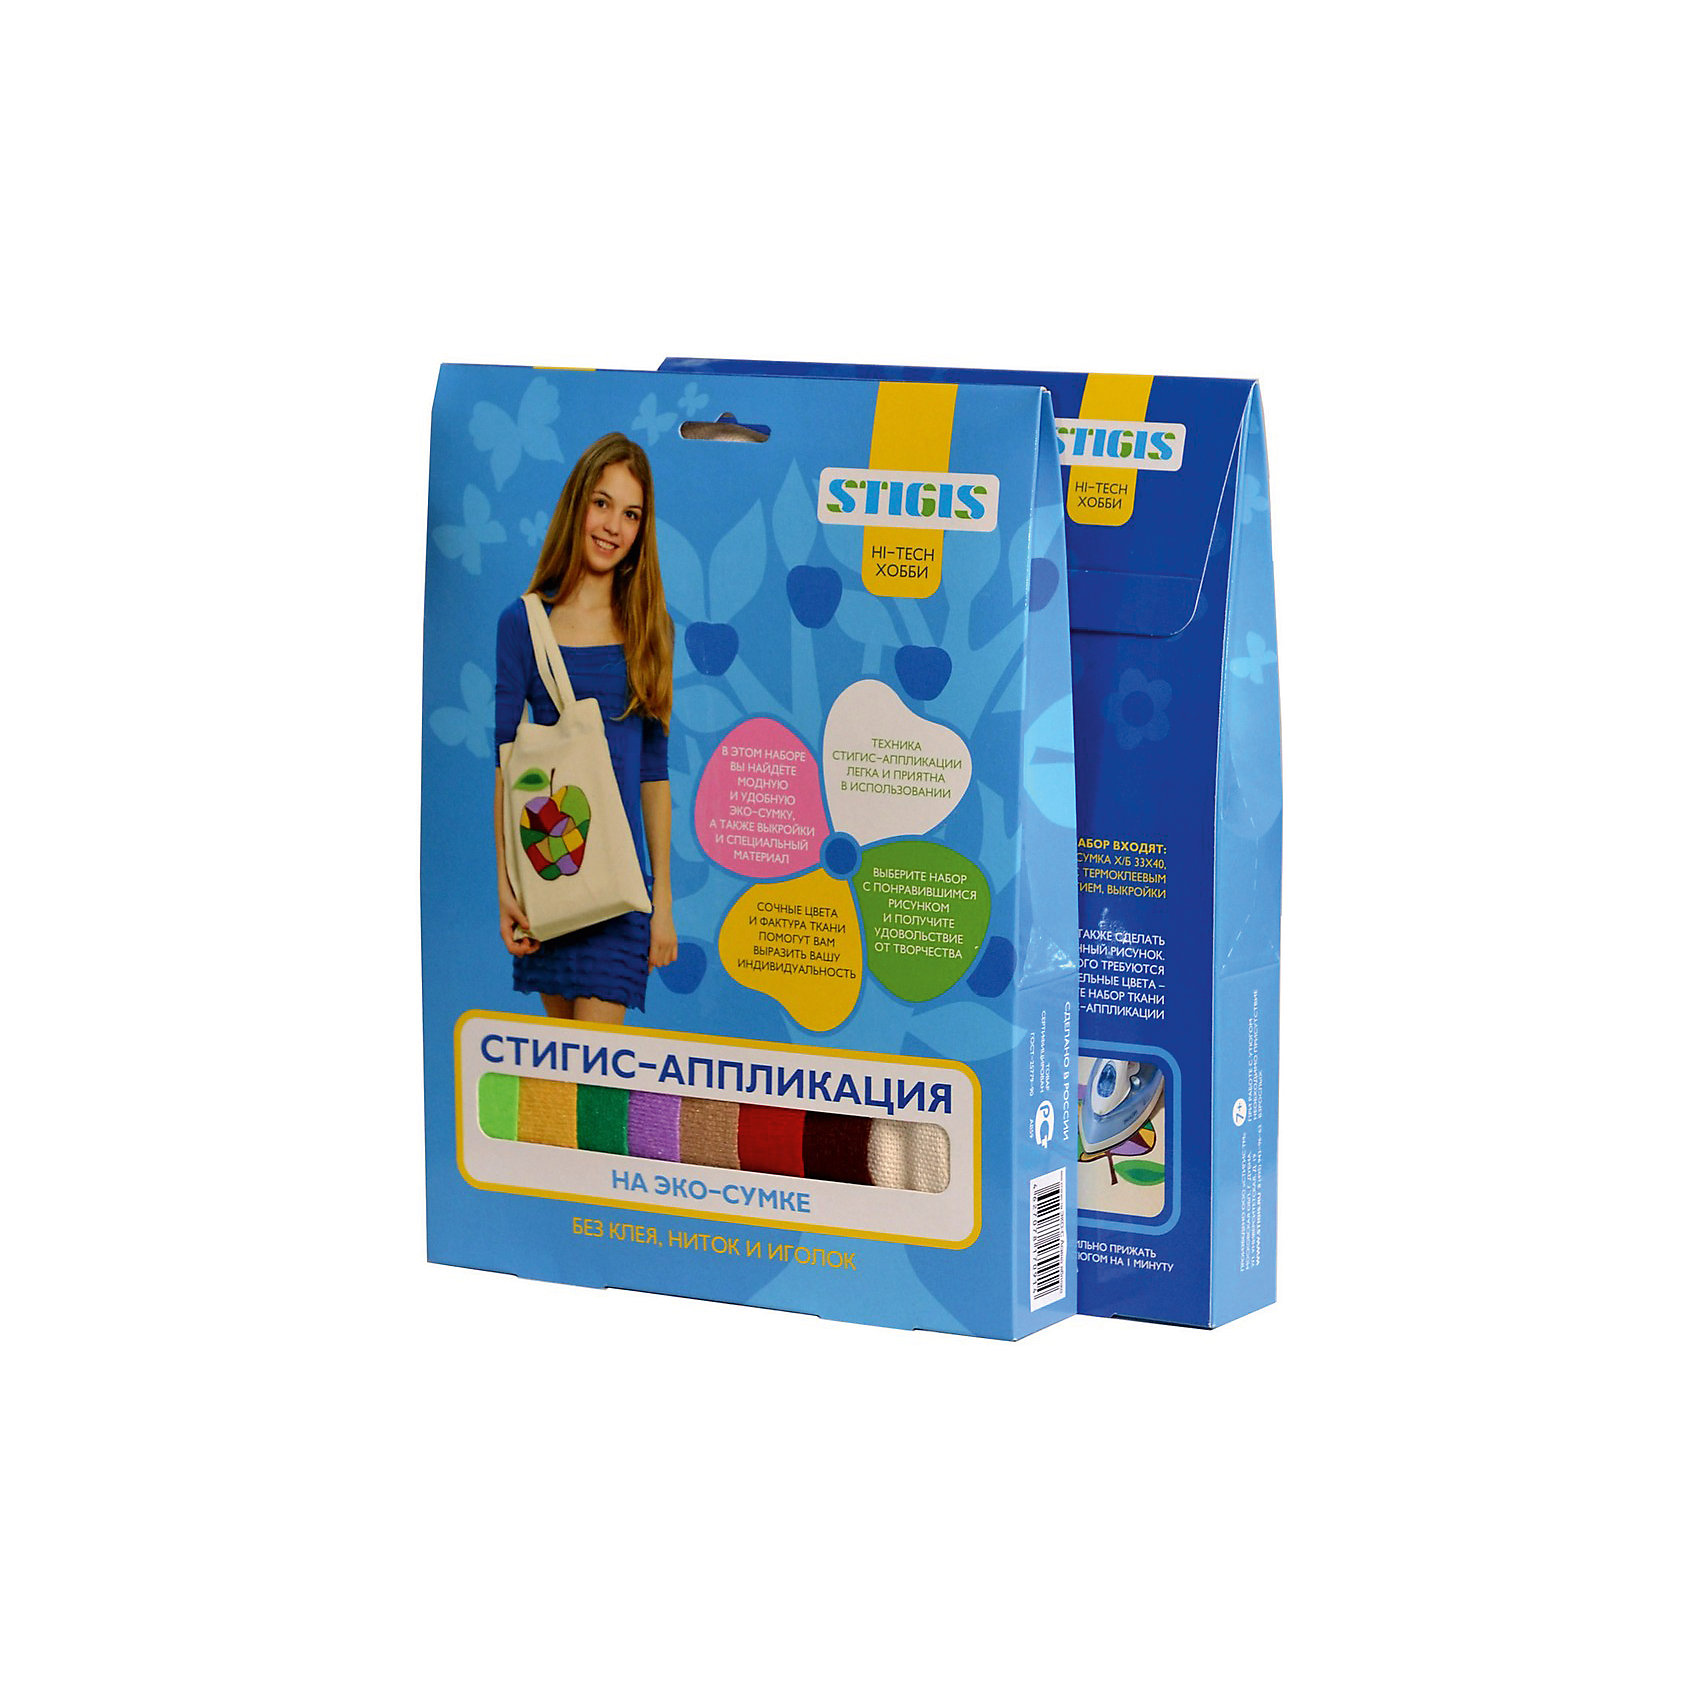 STIGIS Стигис-аппликация на эко-сумке Асино яблоко ароматизатор воздуха chupa chups яблоко на дефлектор мембранный 5 мл